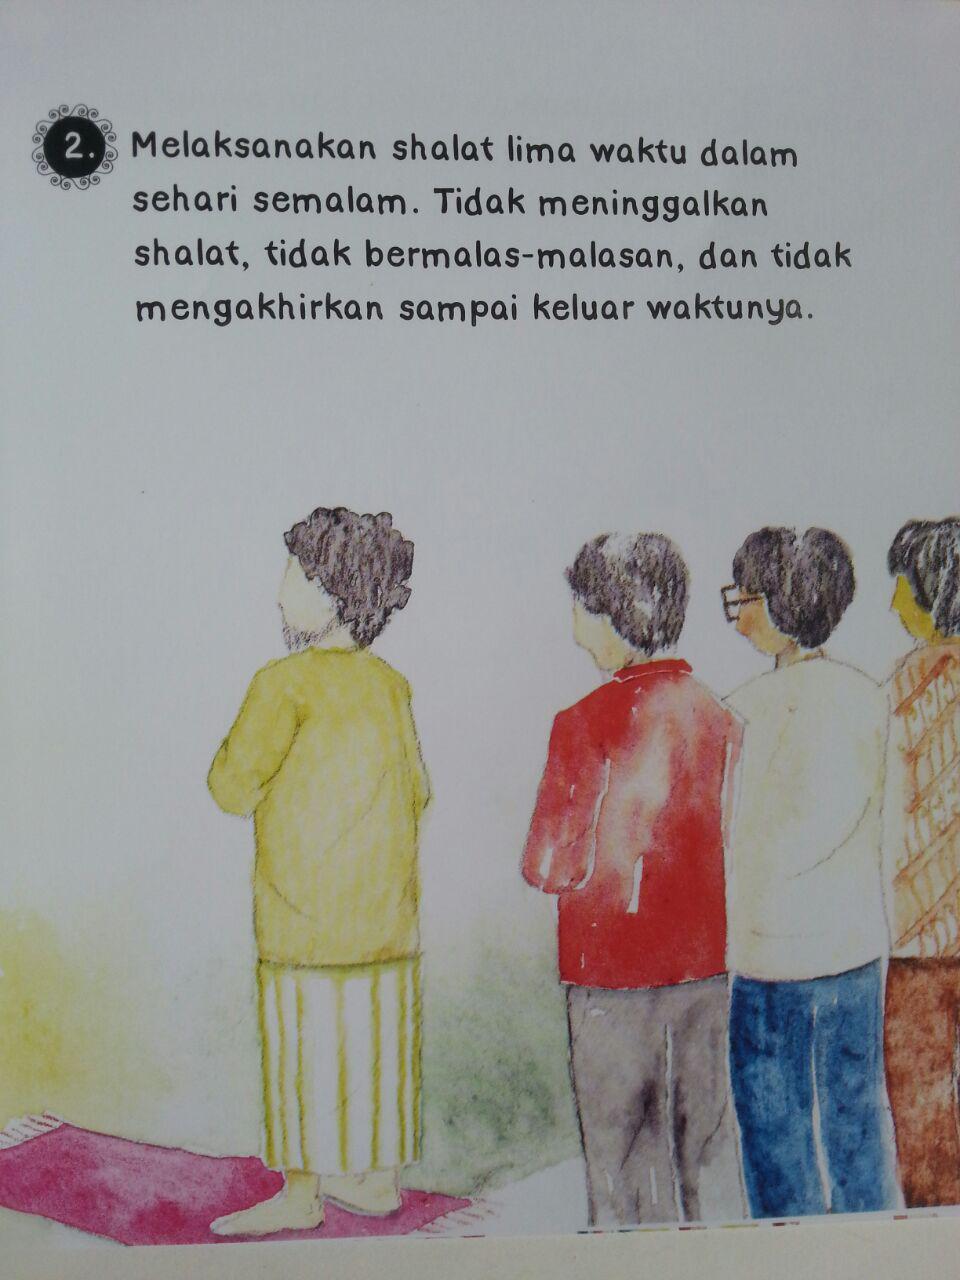 Buku Anak Ushul Tsalatsah For Kids Mengenal Islam isi 3